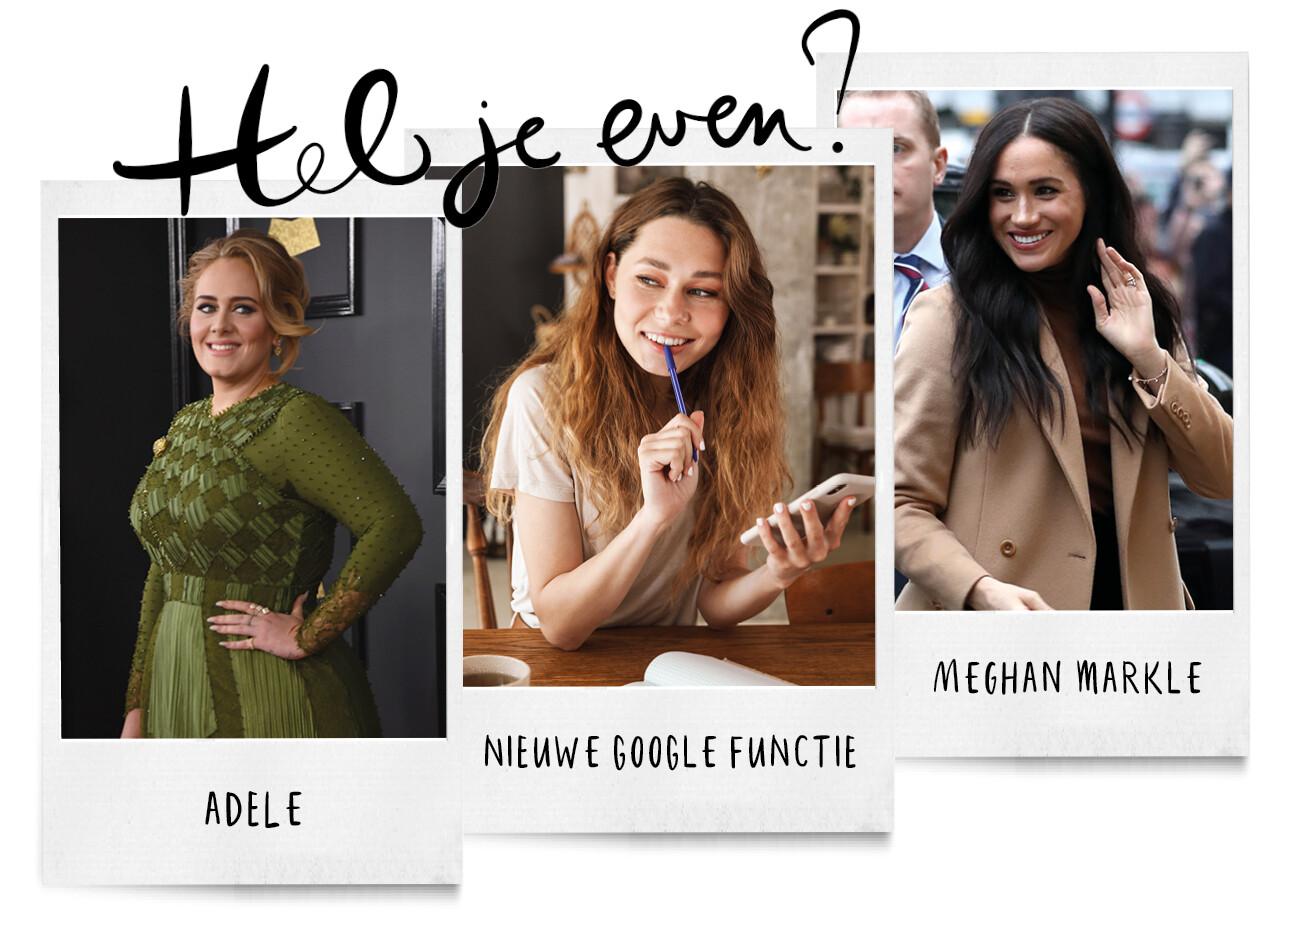 Adele, nieuwe google functie en meghan markle